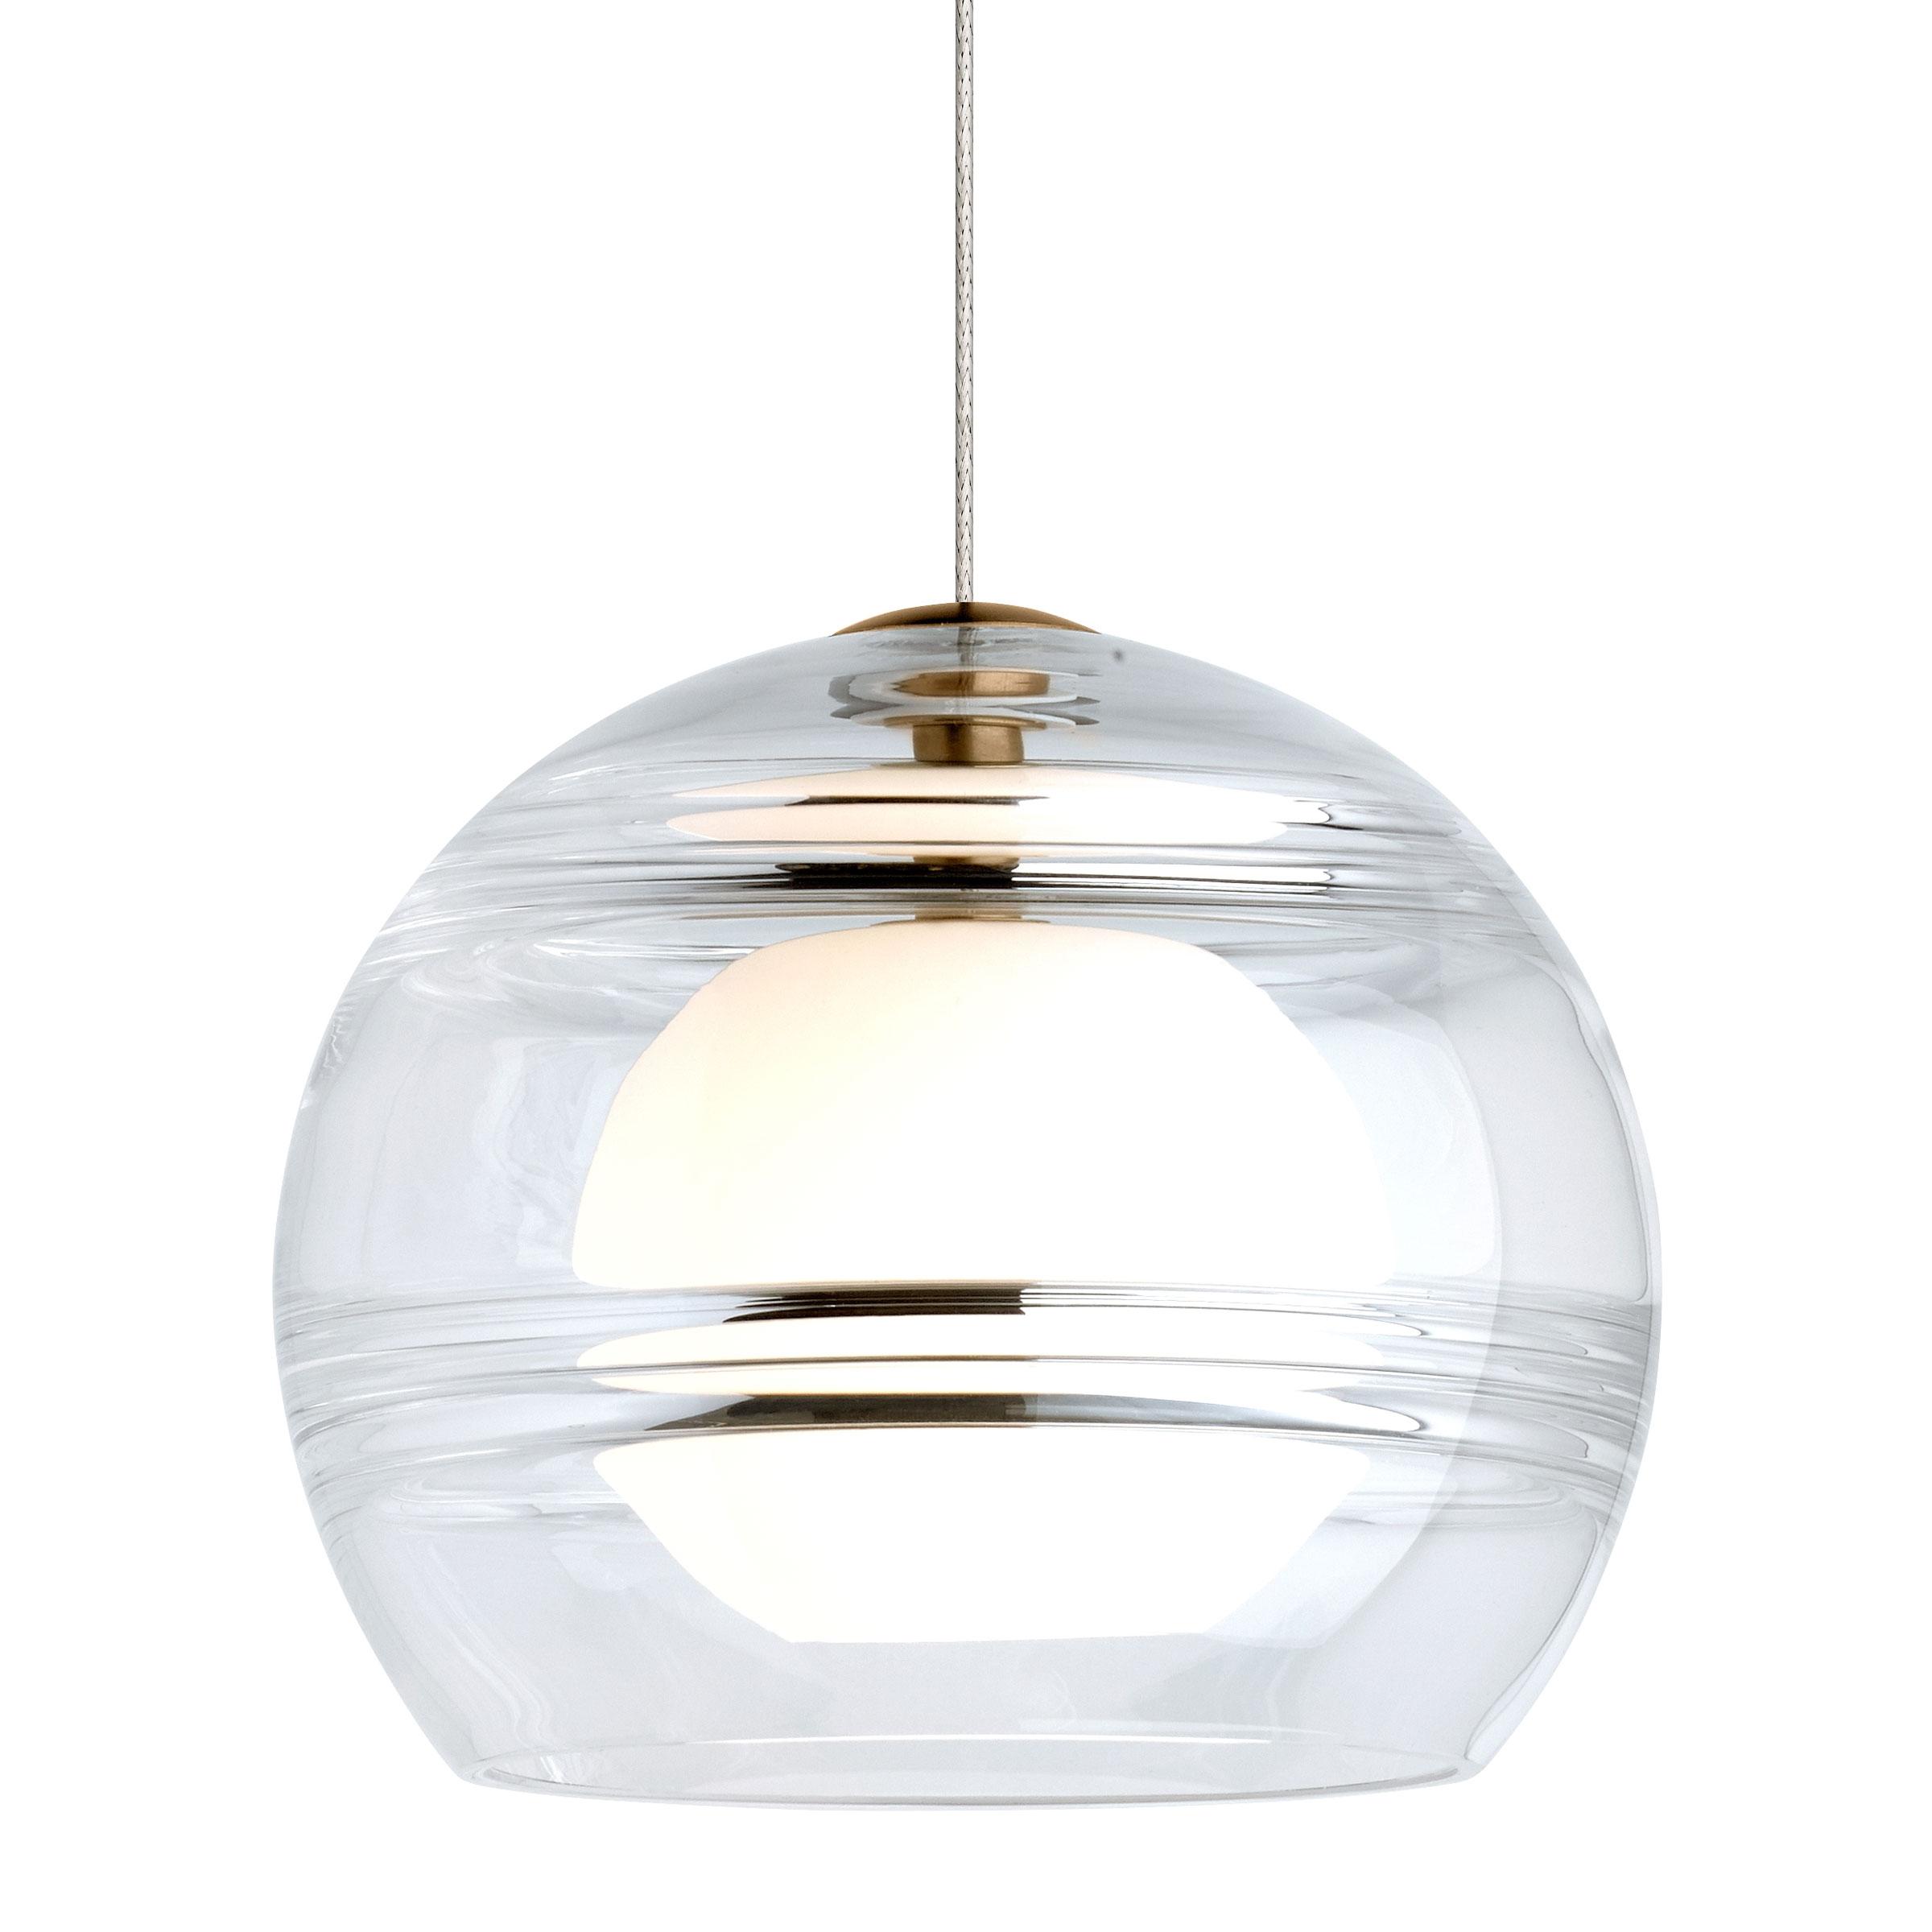 Sedona Freejack Pendant By Tech Lighting 700fjsdncr Leds930